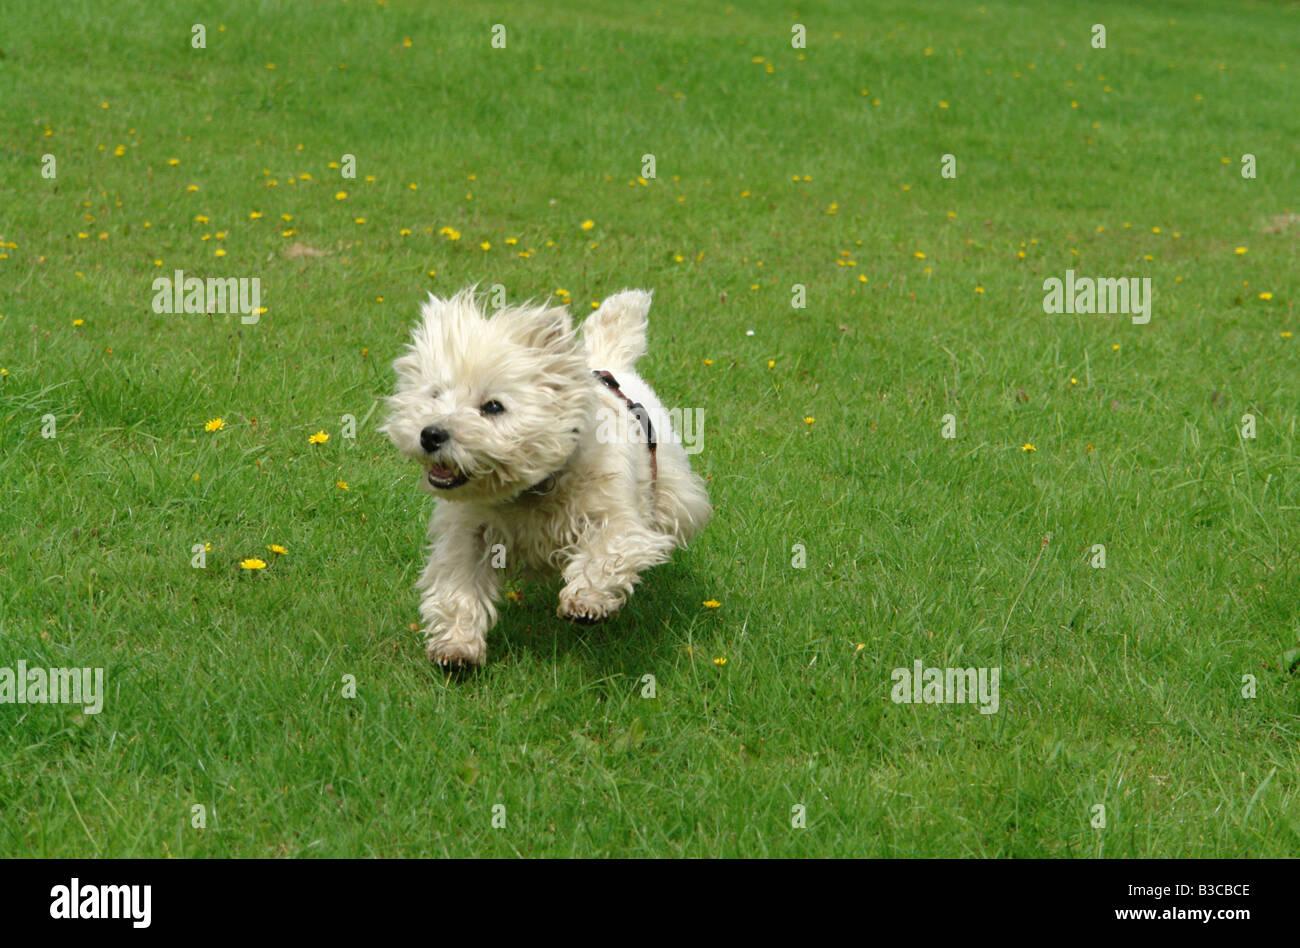 Scottish Terrier Running Stock Photos & Scottish Terrier Running